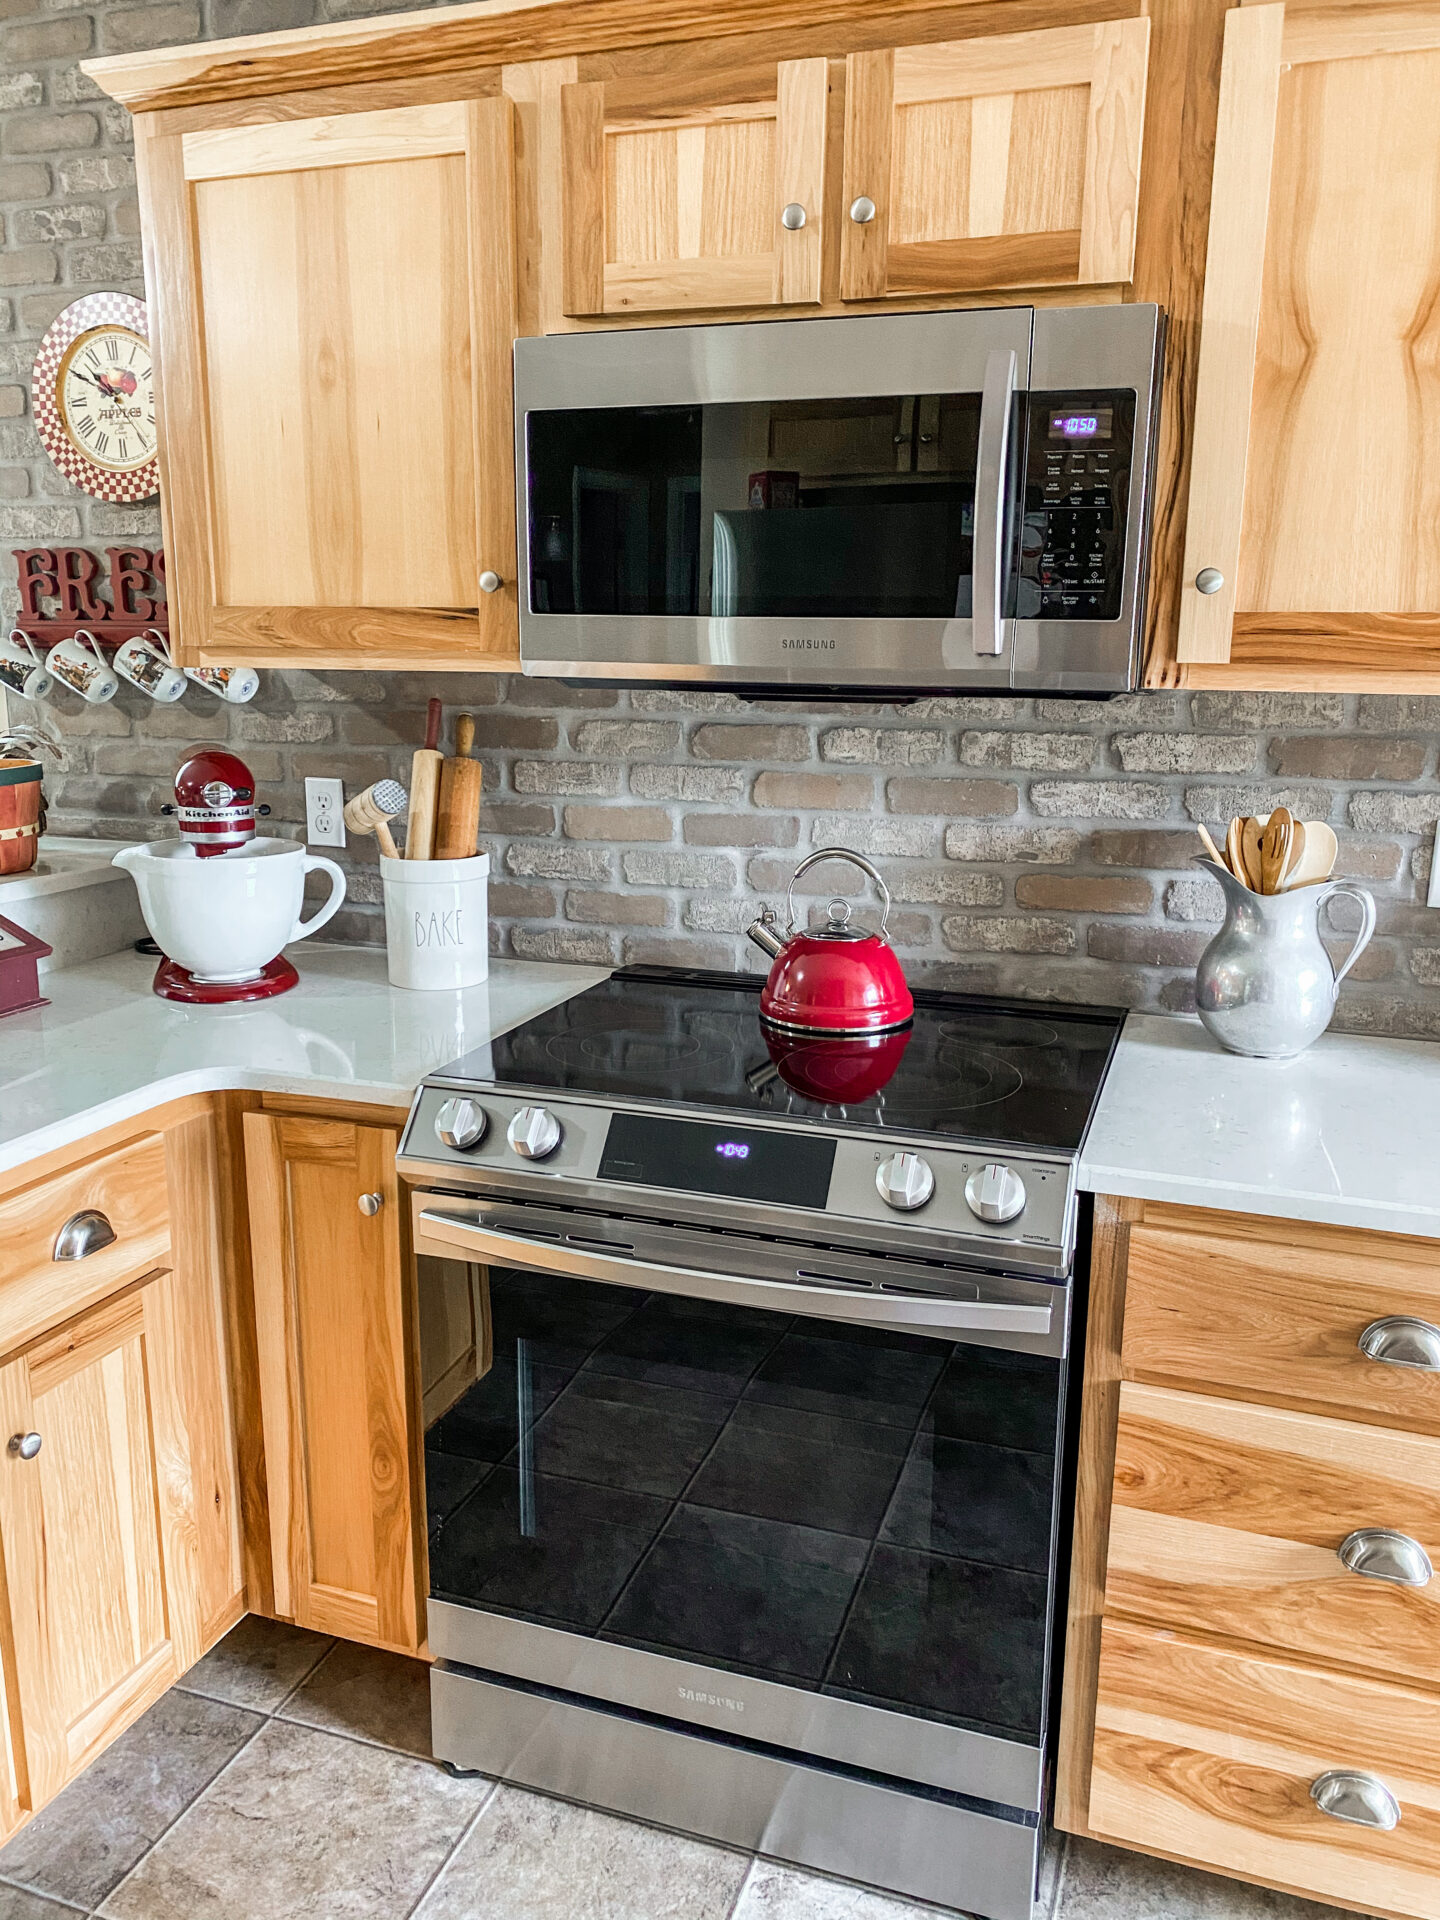 Country Kitchen with brick wall backsplash, kitchenaid stand mixer and antiques.